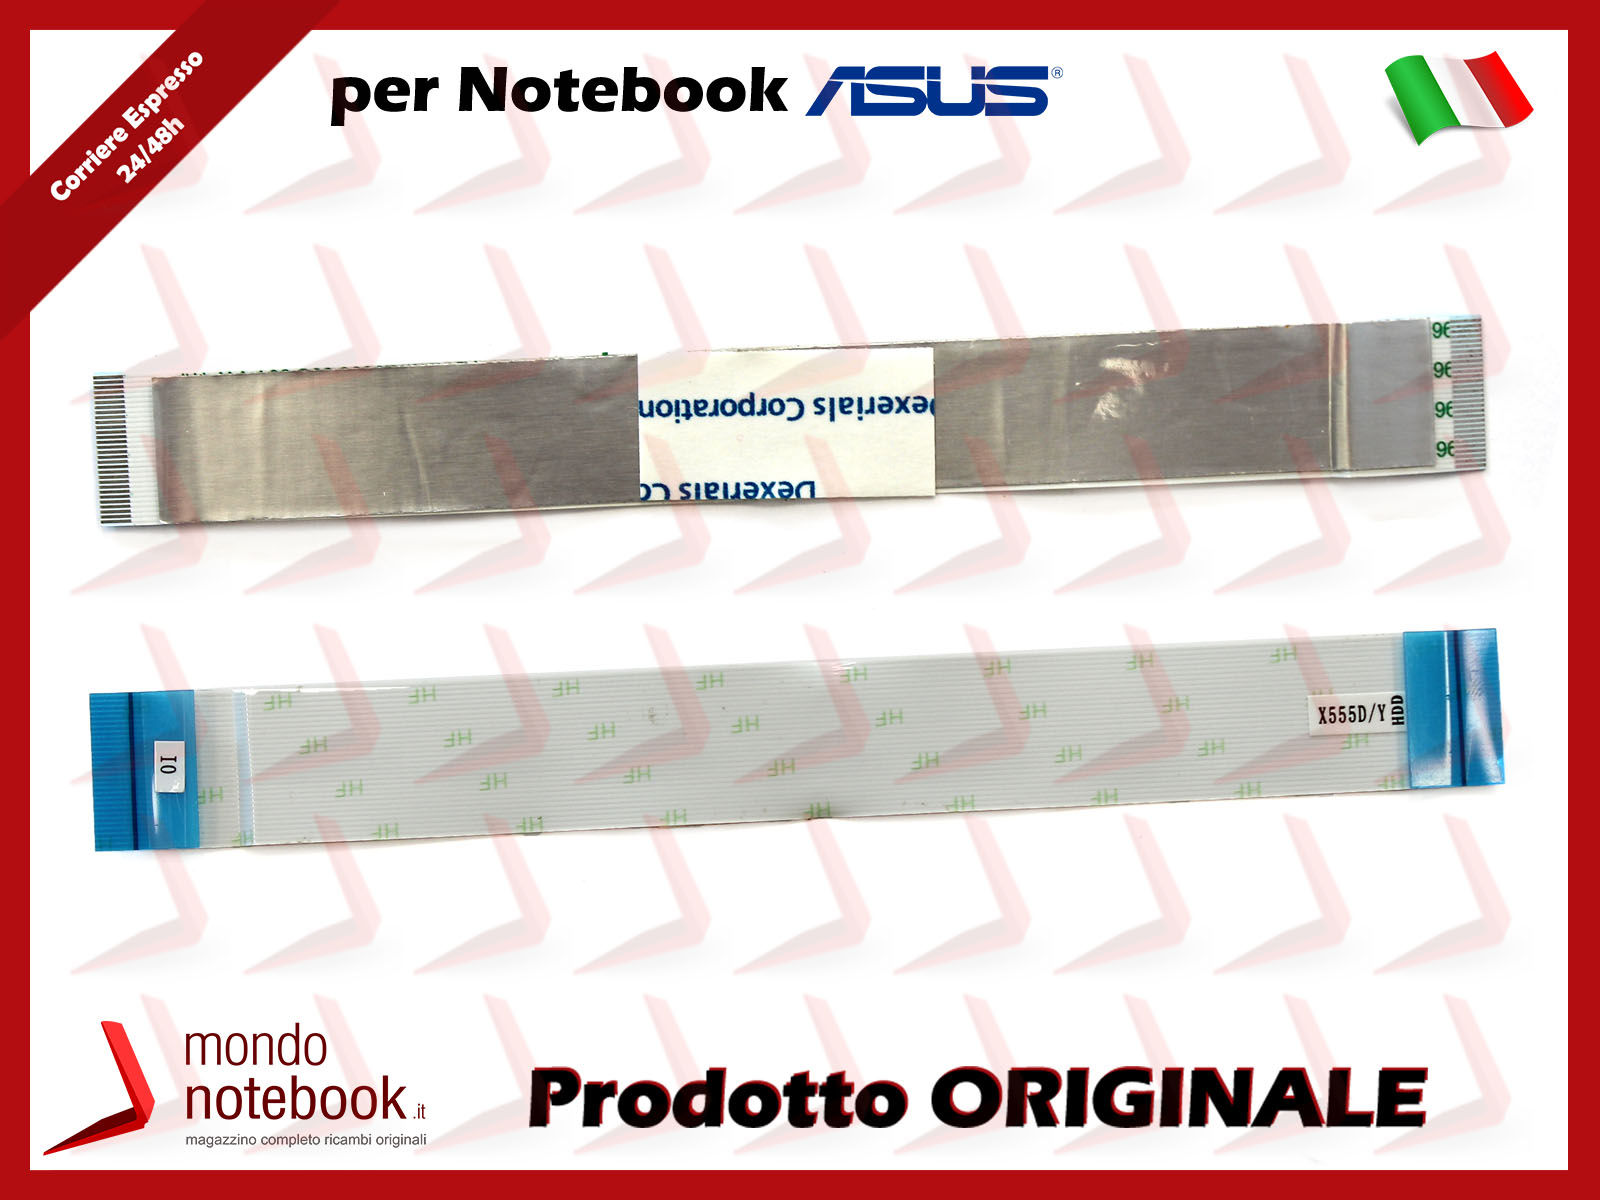 https://www.mondonotebook.it/5678/batteria-rigenerata-originale-hp-dv3000-dv3100-dv3500-6-celle.jpg